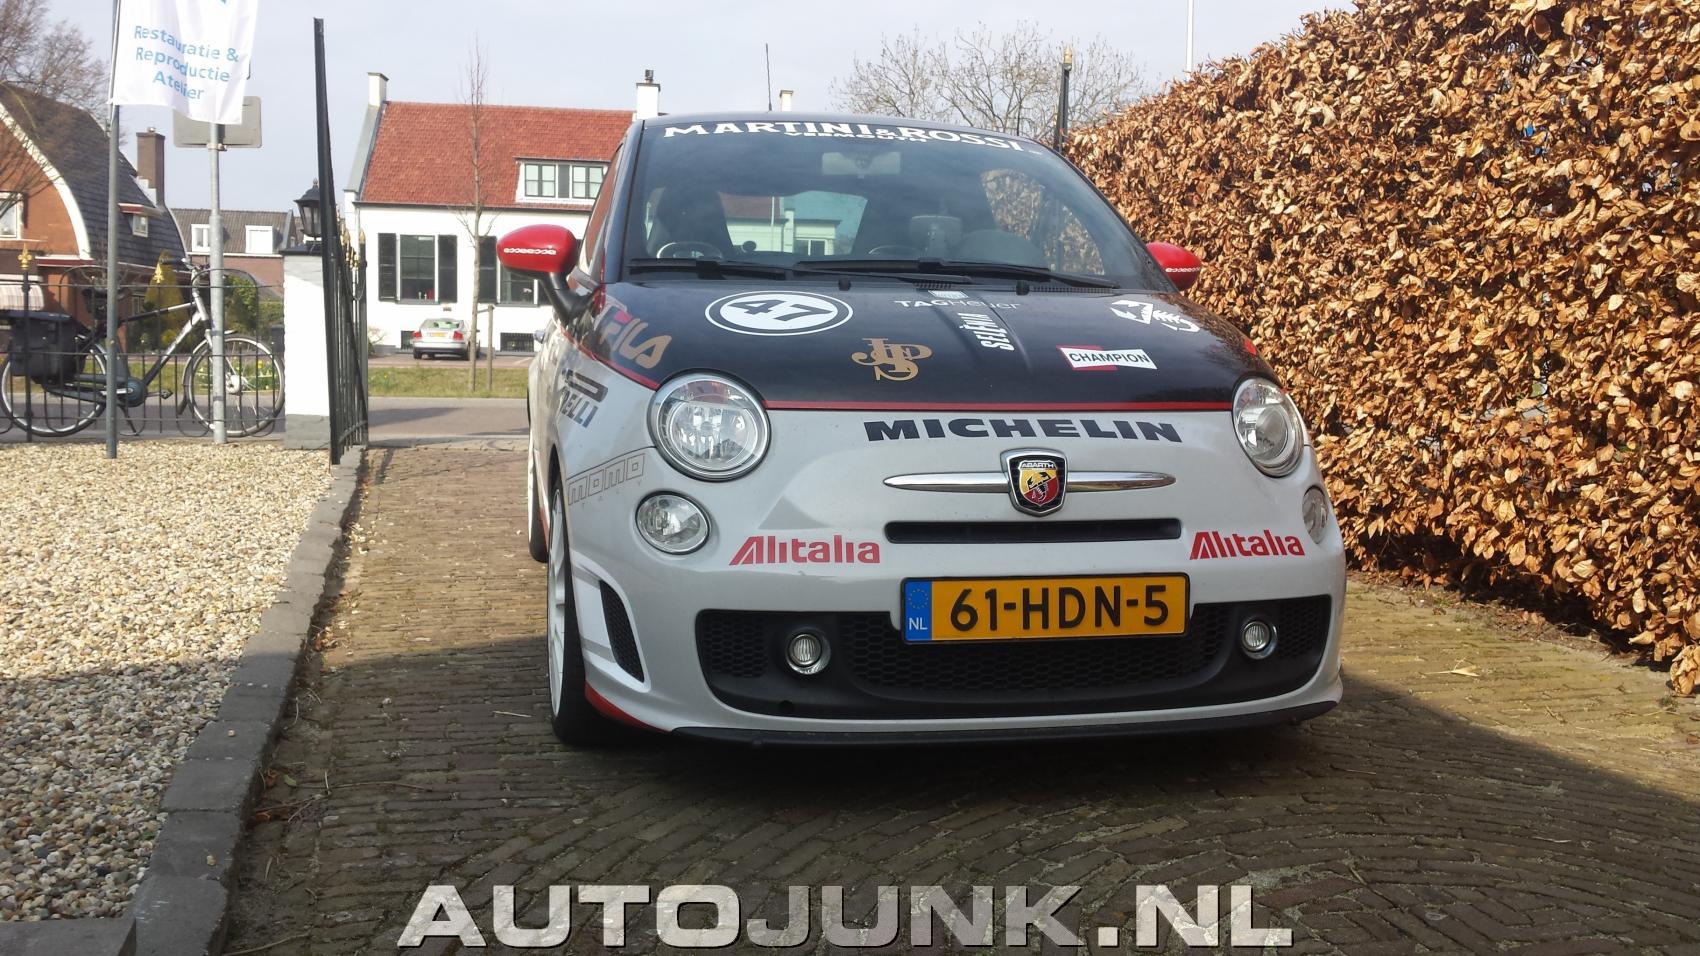 Abarth 500 Esseesse Gumball 3000 foto's » Autojunk.nl (137619)